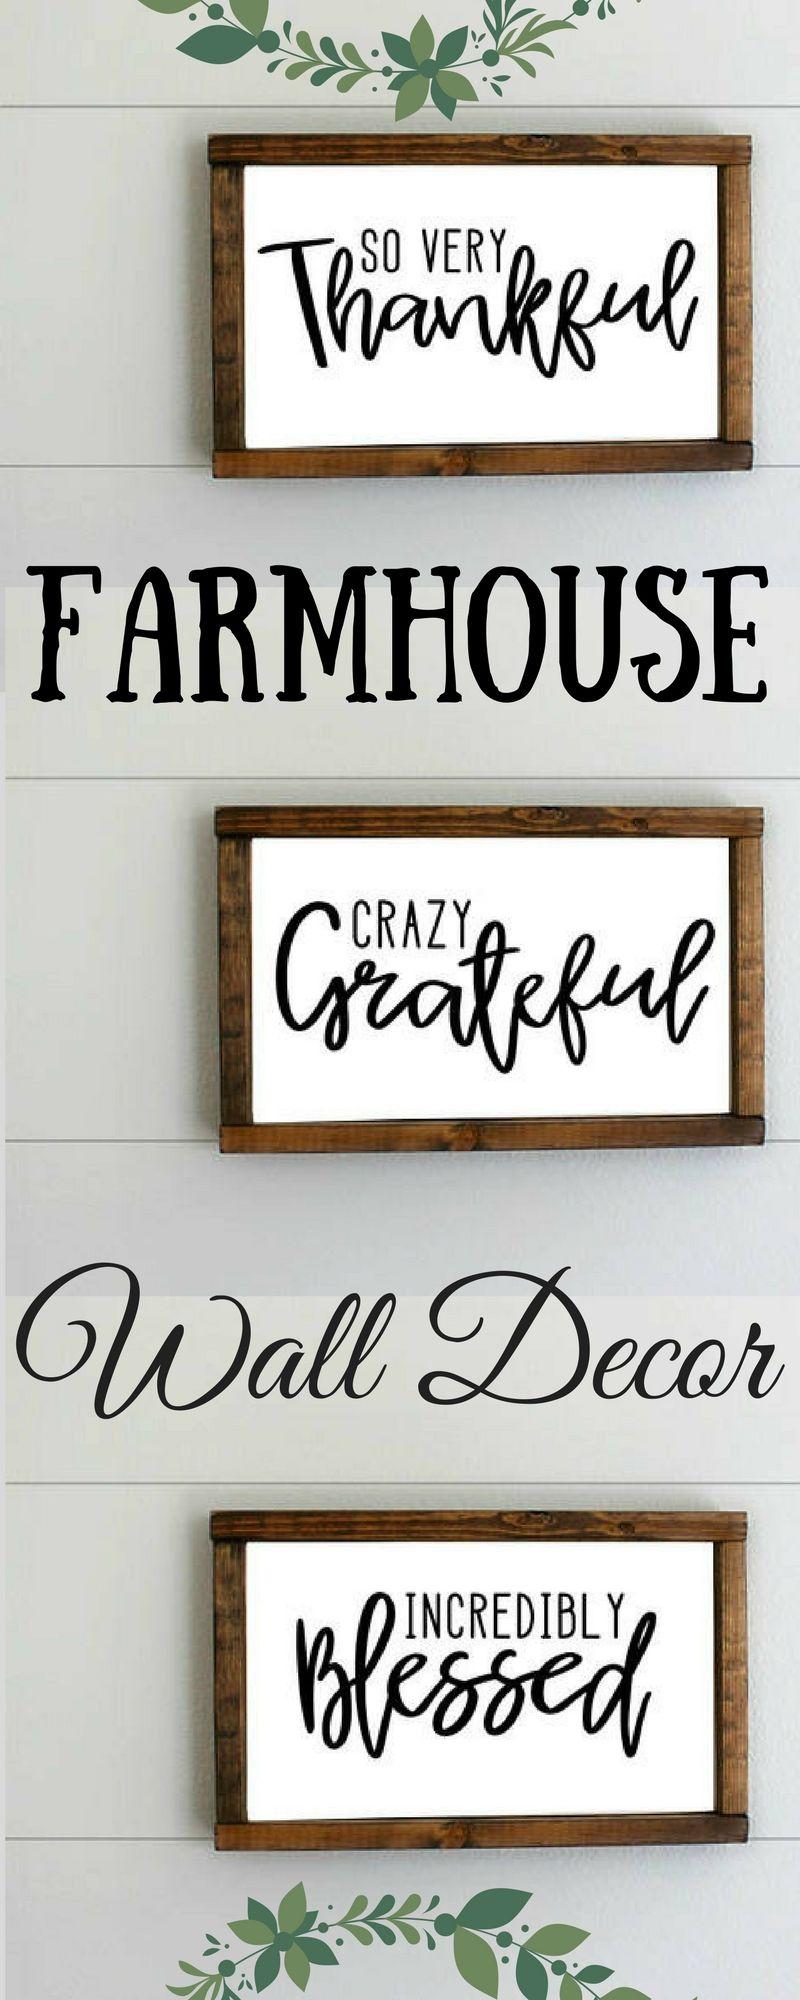 Love This Farmhouse Decor Home Decor Ideas Farmhouse Rustic Wood Signs Diy Cheap Wall Decor Prints Af Rustic Wood Signs Diy Diy Wood Signs Sign Quotes